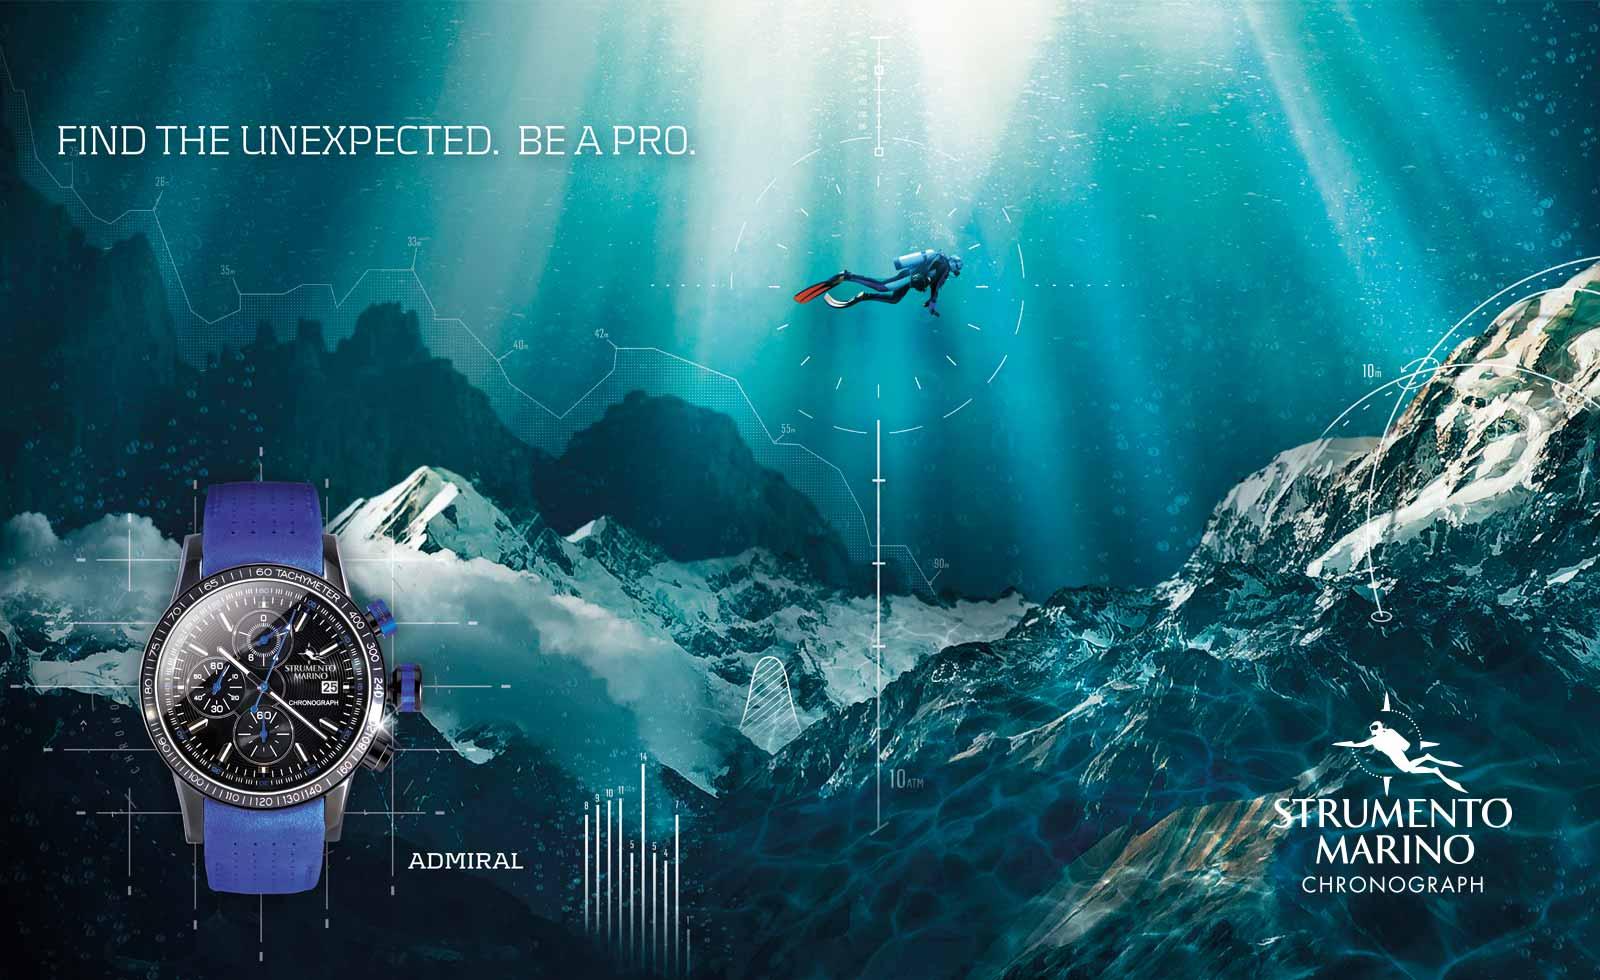 strumento marino advertising adv campaign